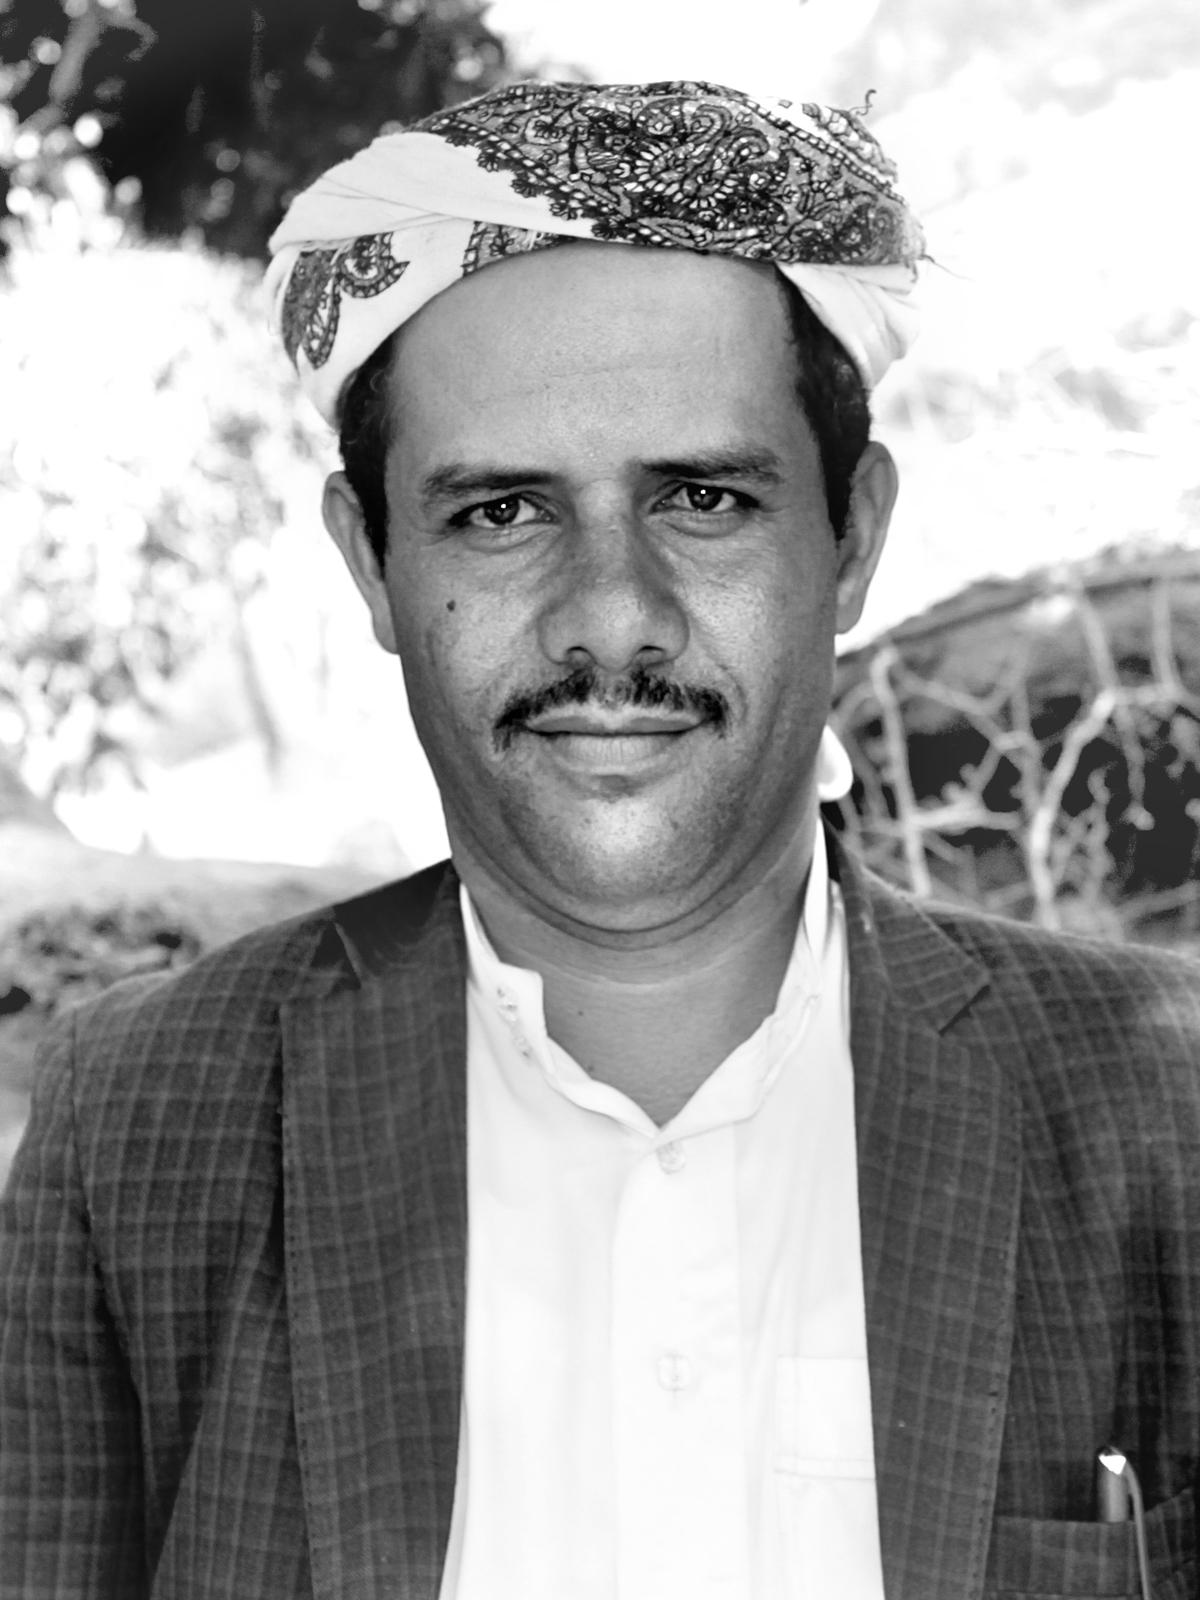 Adnan-Abdullah-828.jpg